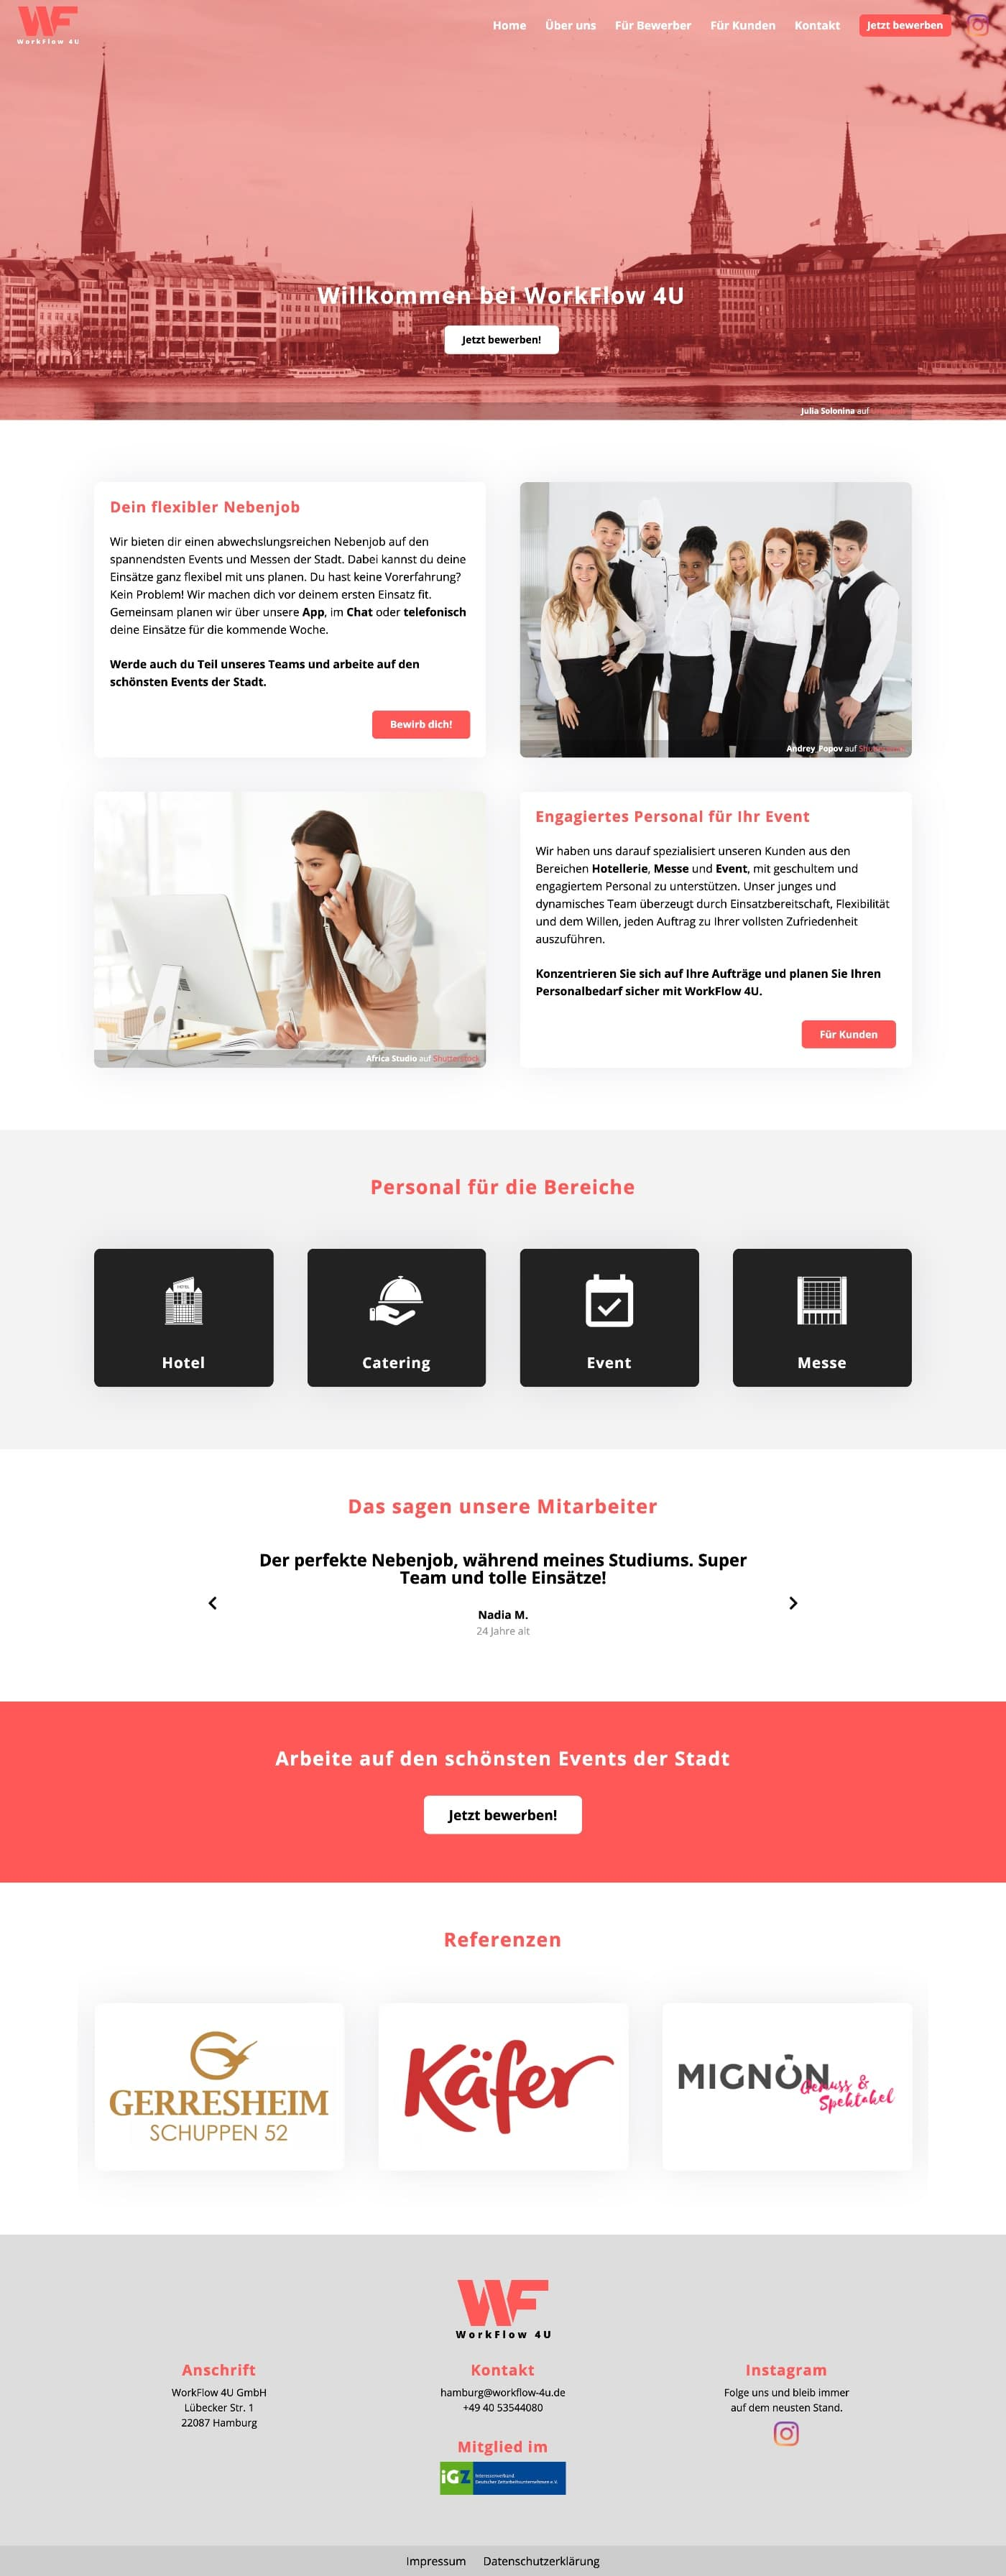 WorkFlow 4U - Website